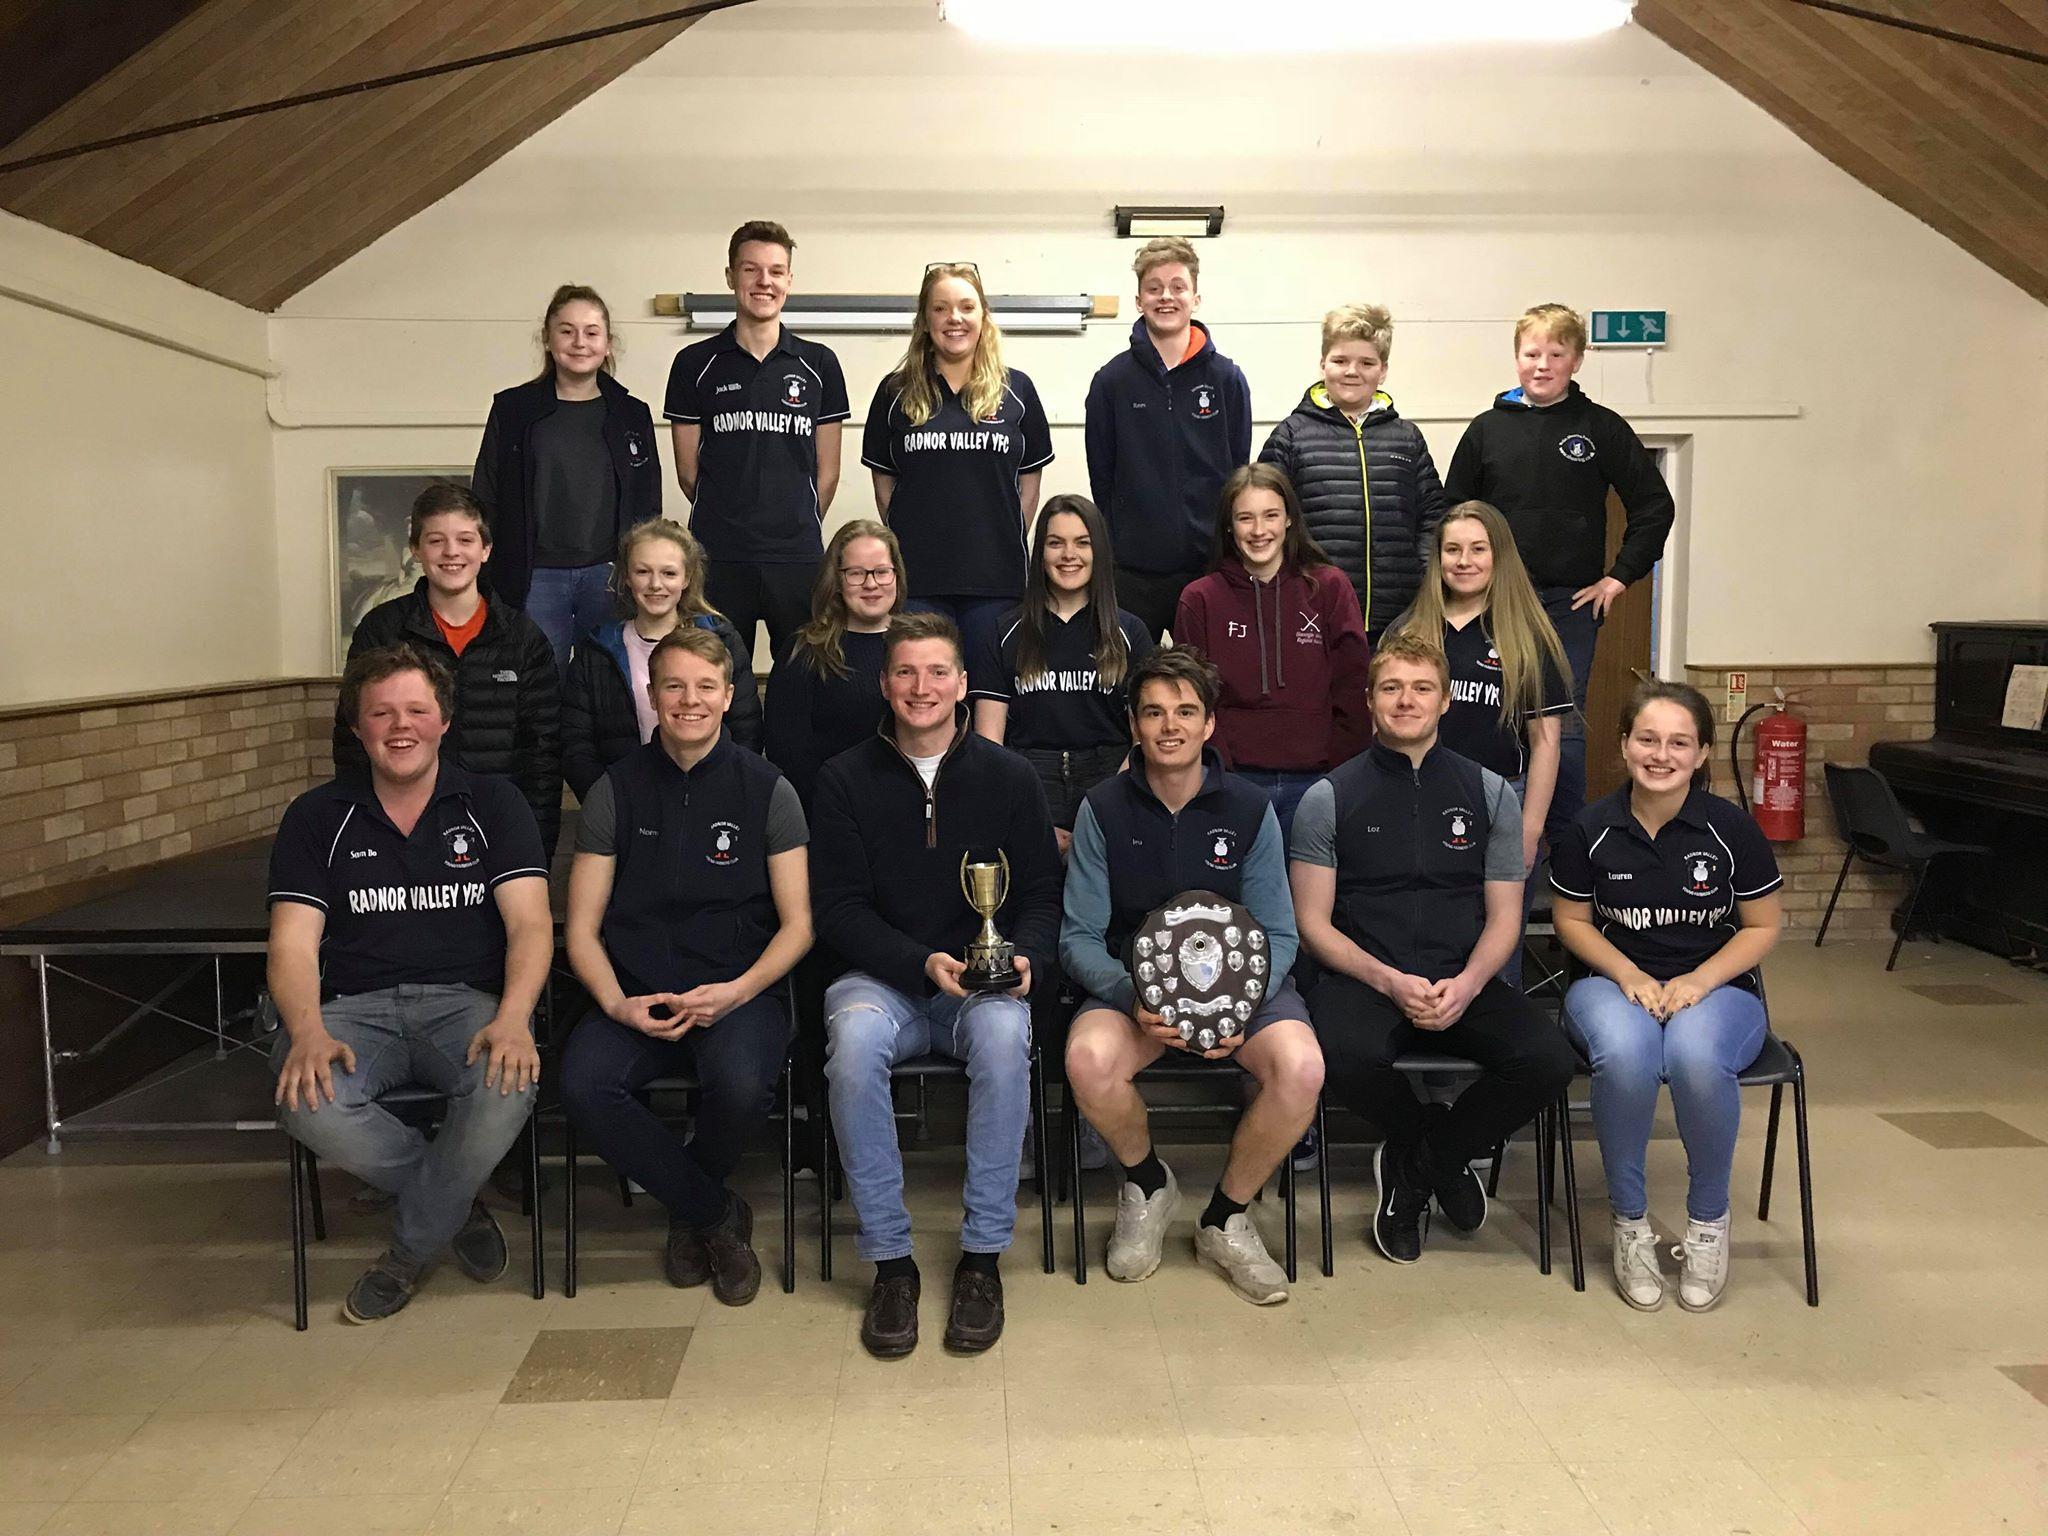 Last year's Field Day winners: Radnor Valley YFC